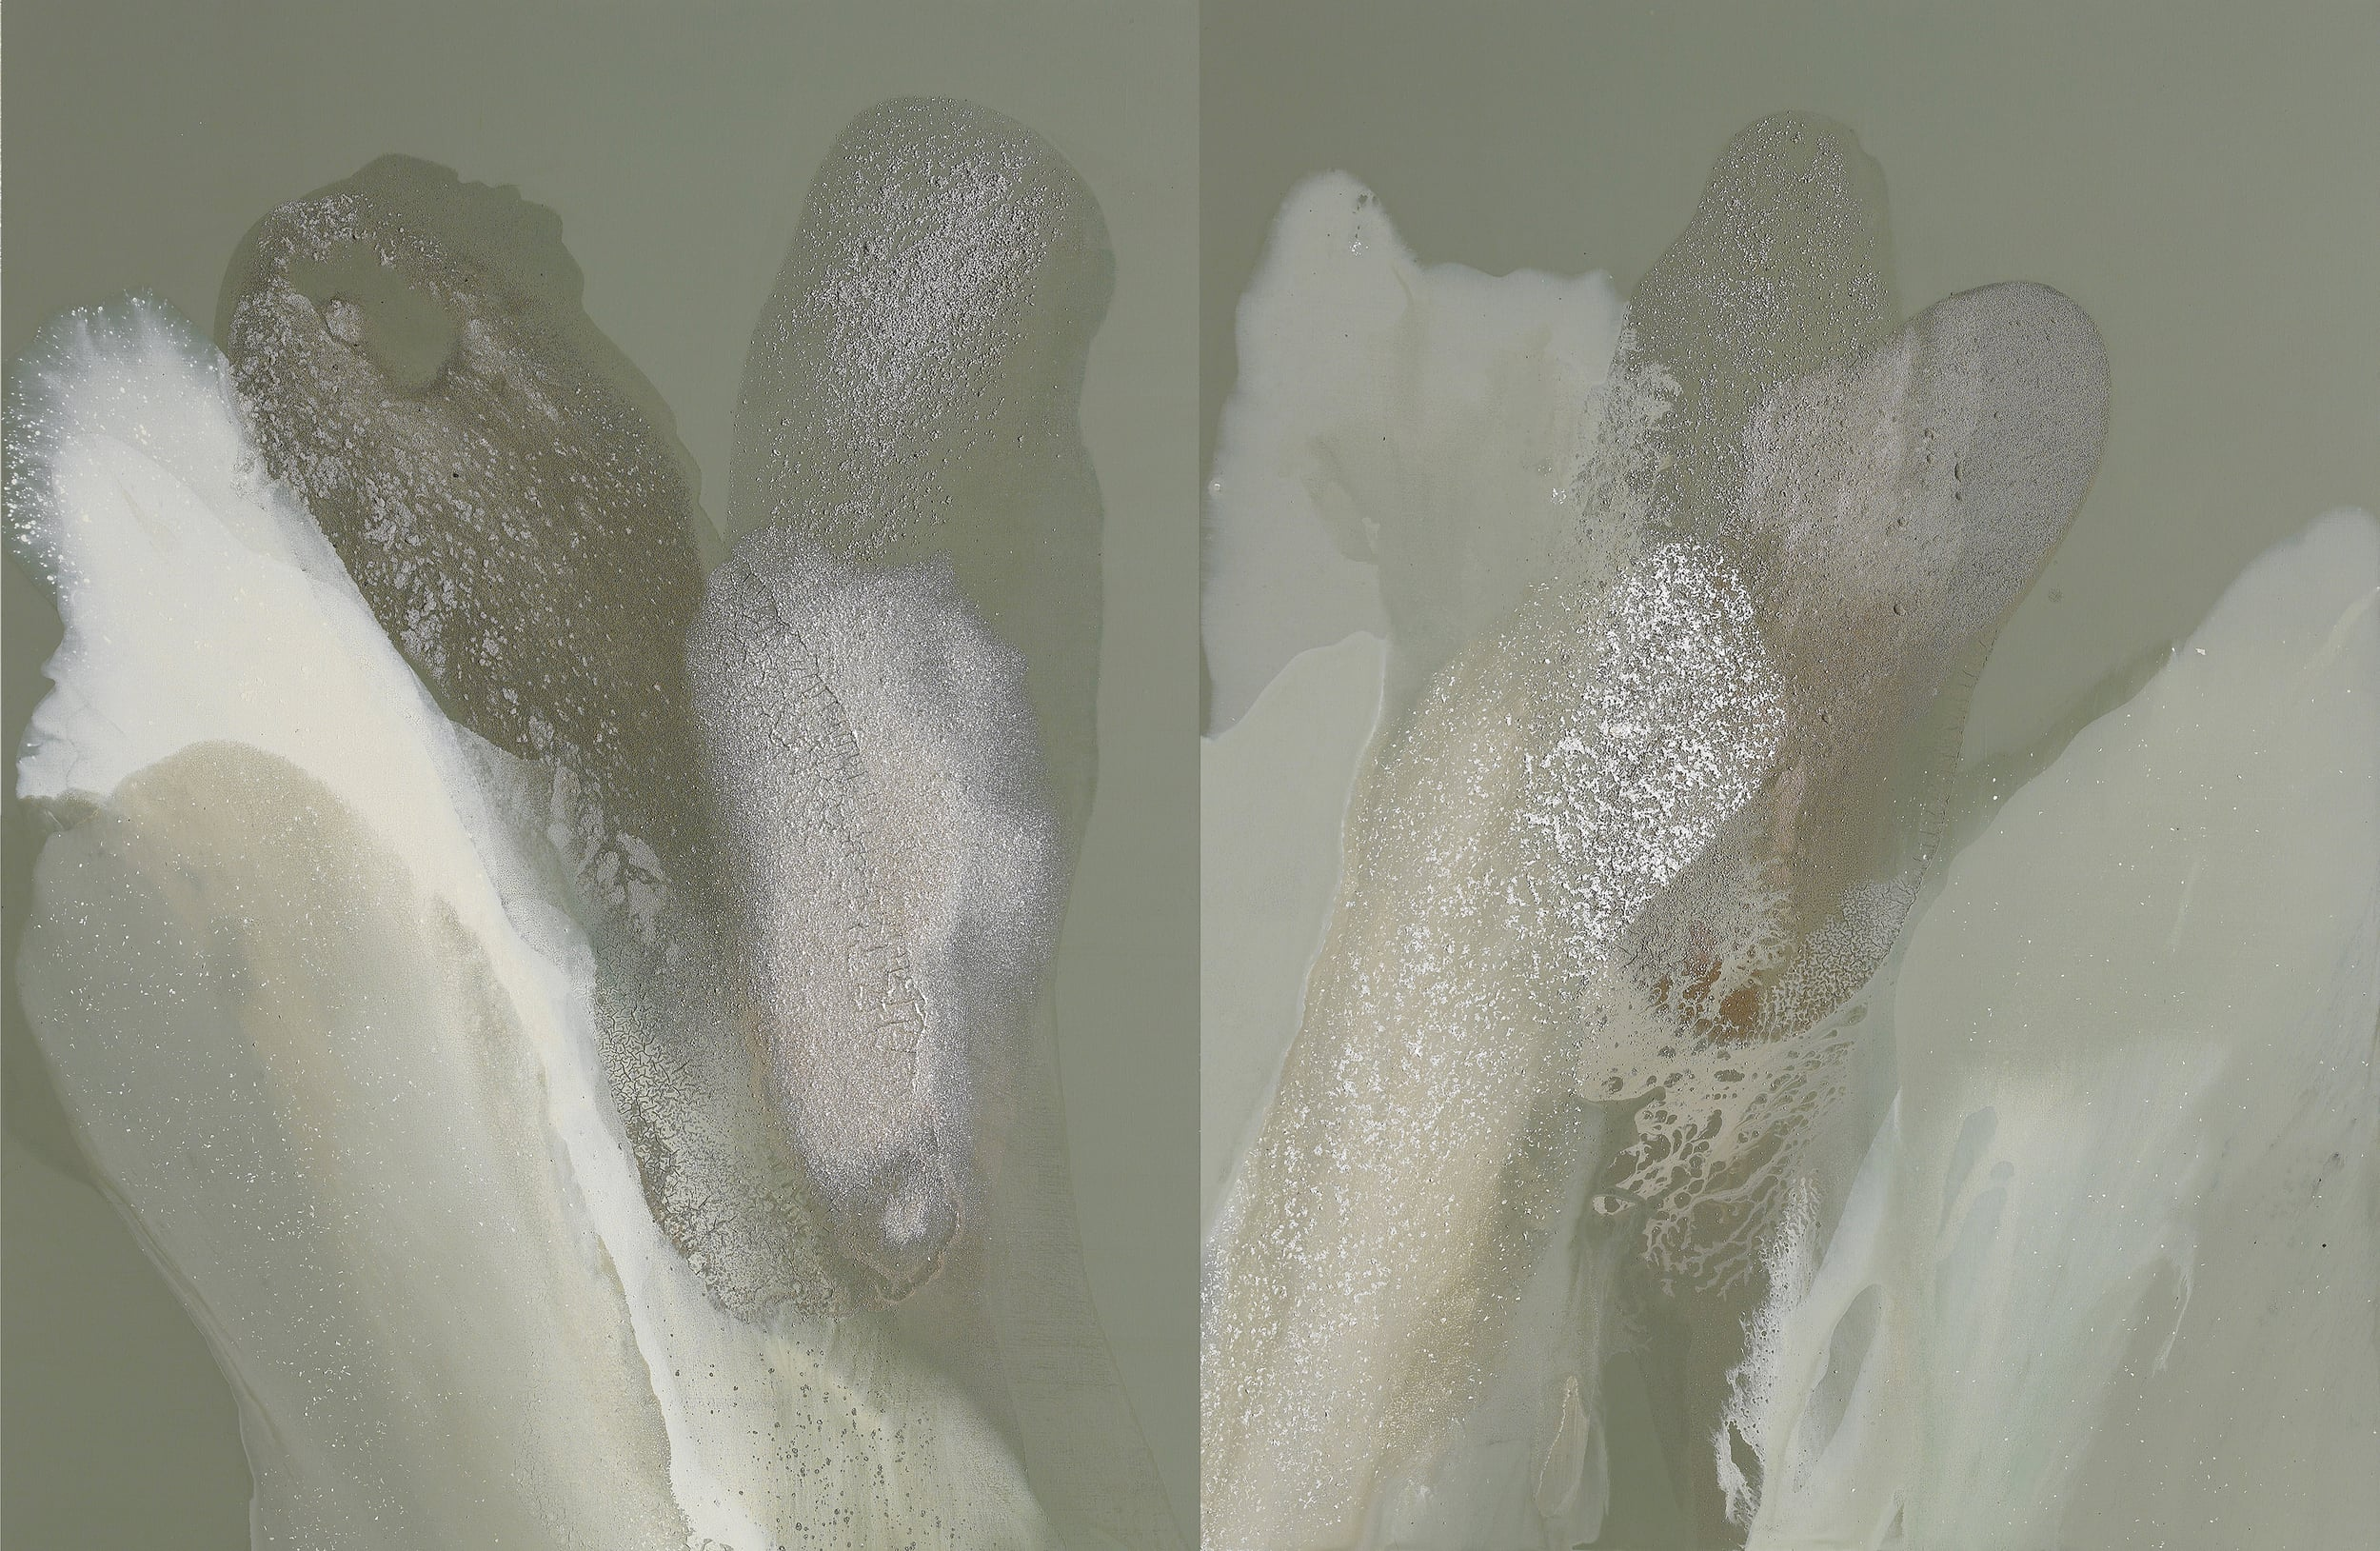 figure_16  acrylic and pumice  gel on canvas  139 cm X 162 cm  2014